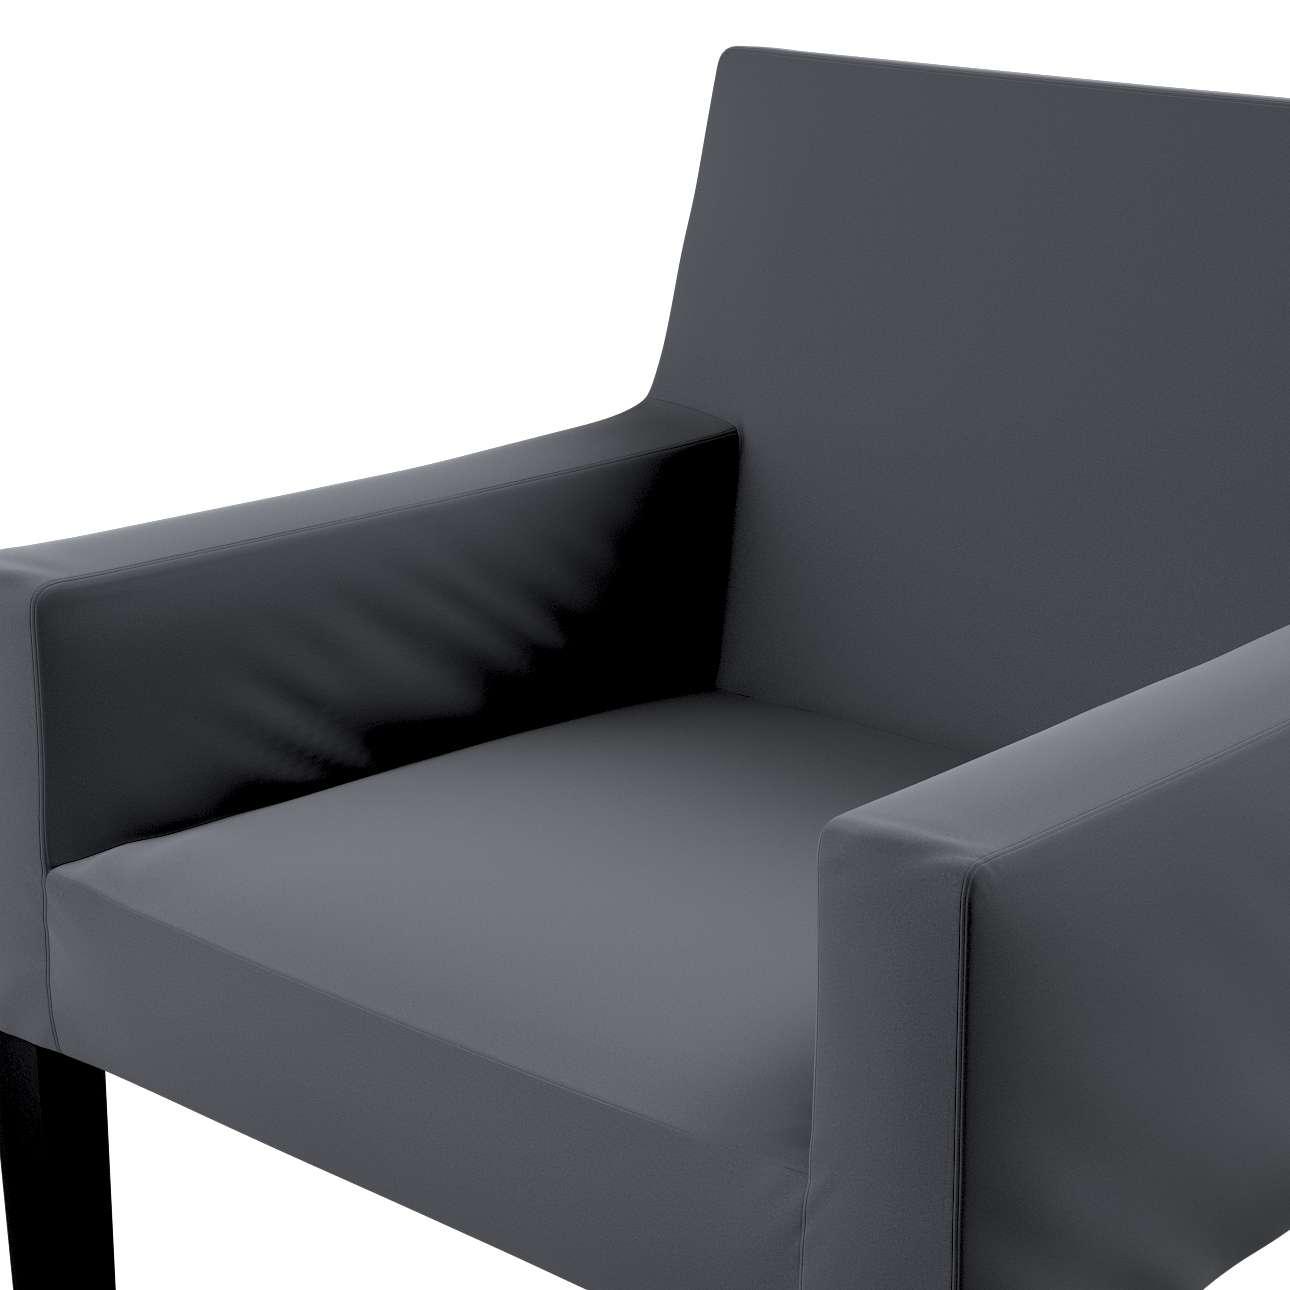 Návlek na stoličku s opierkami Nils V kolekcii Velvet, tkanina: 704-12